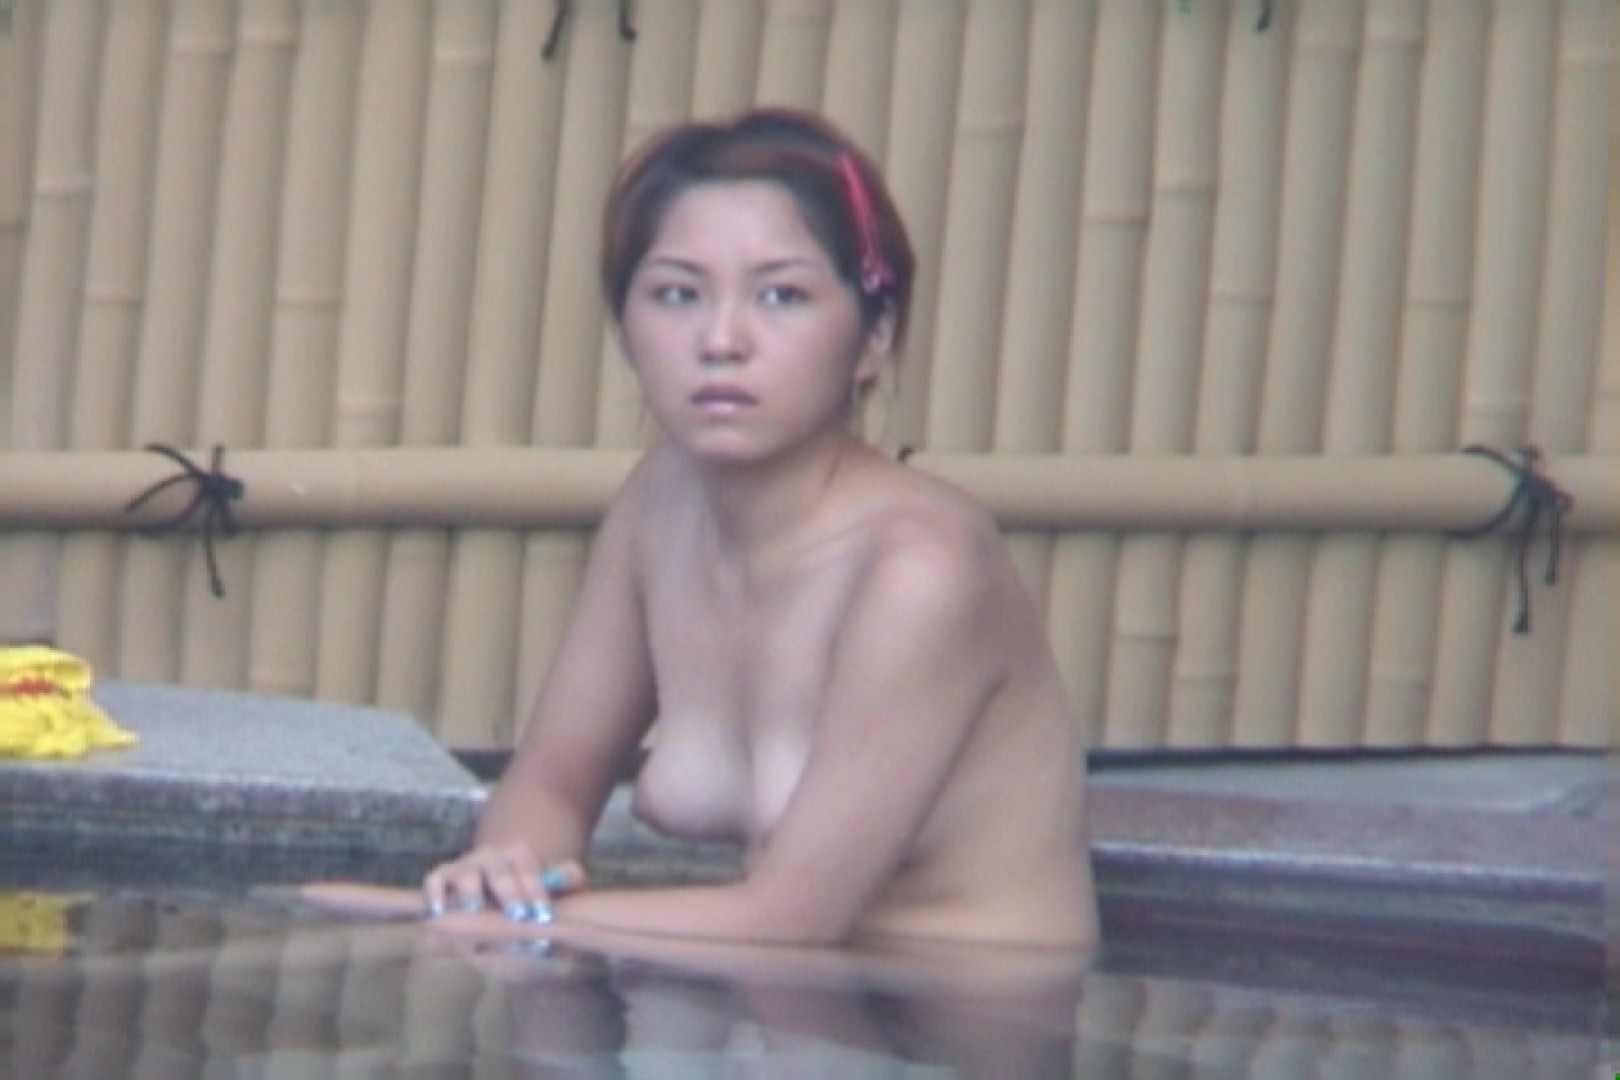 Aquaな露天風呂Vol.574 0  81連発 54